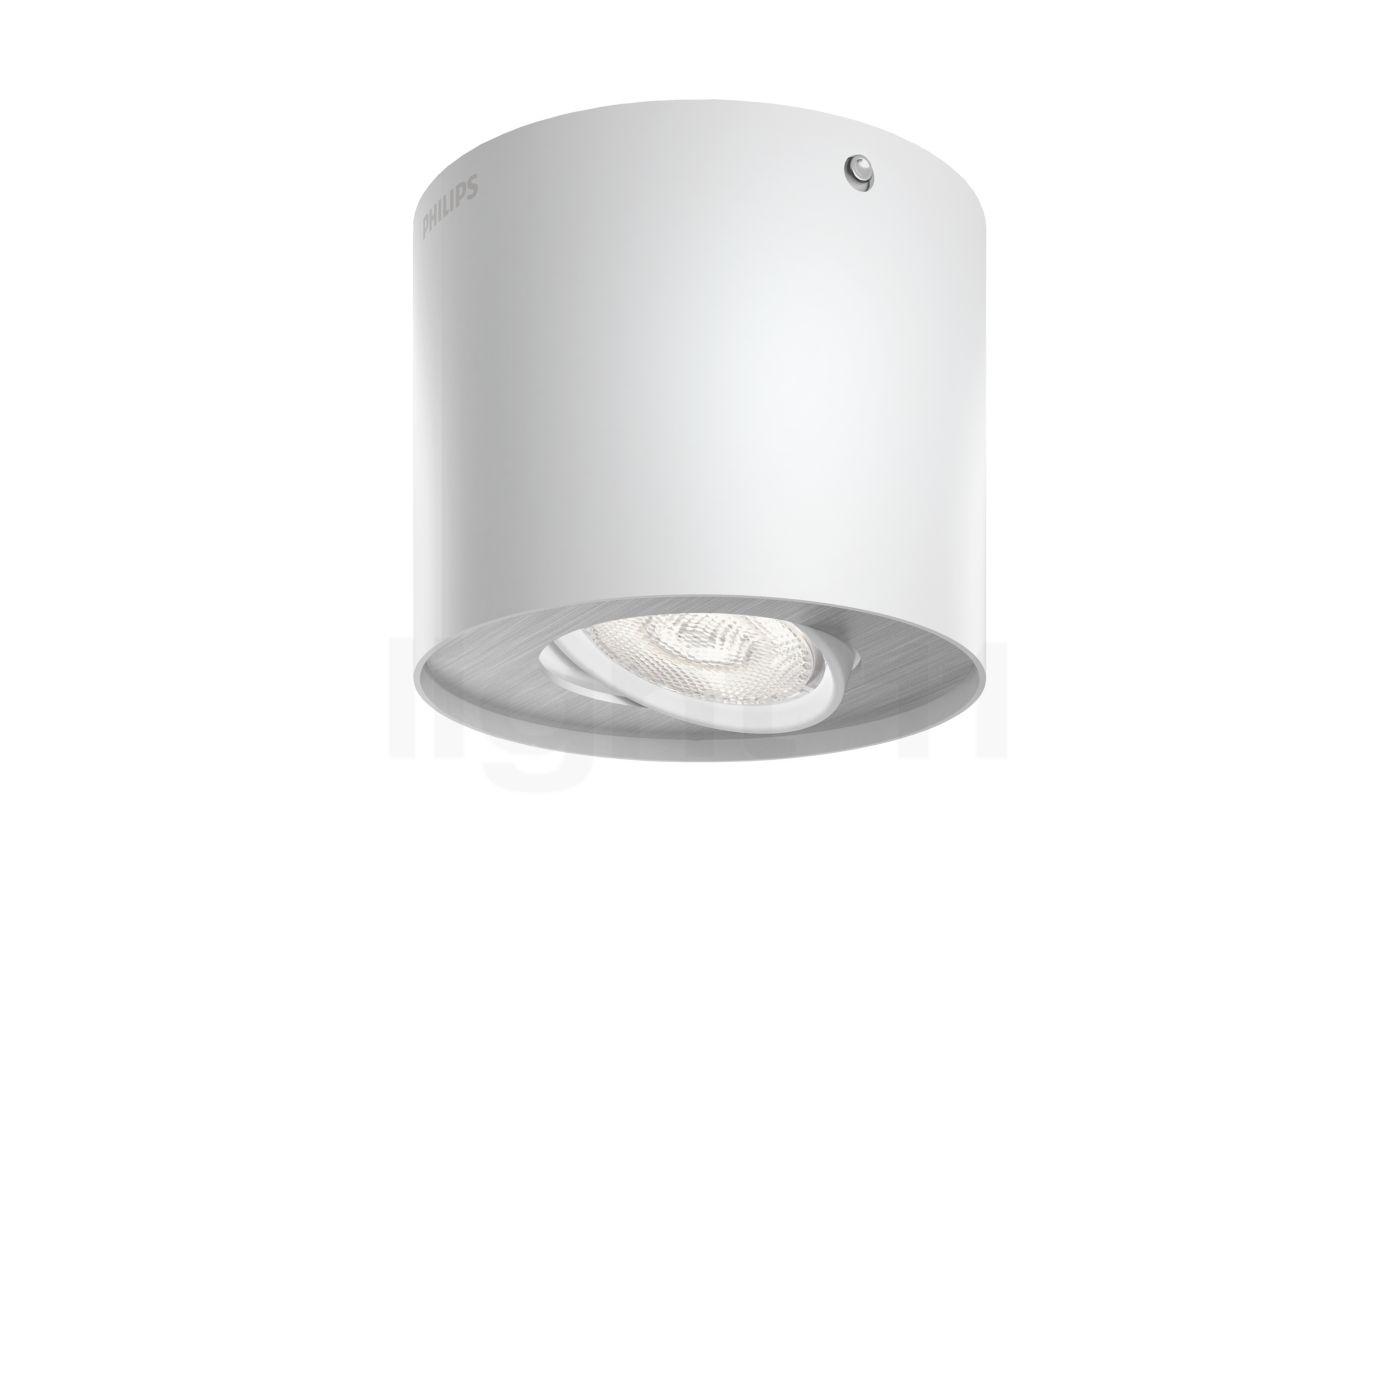 Buy philips myliving phase ceiling light led 1 lamp at mozeypictures Choice Image